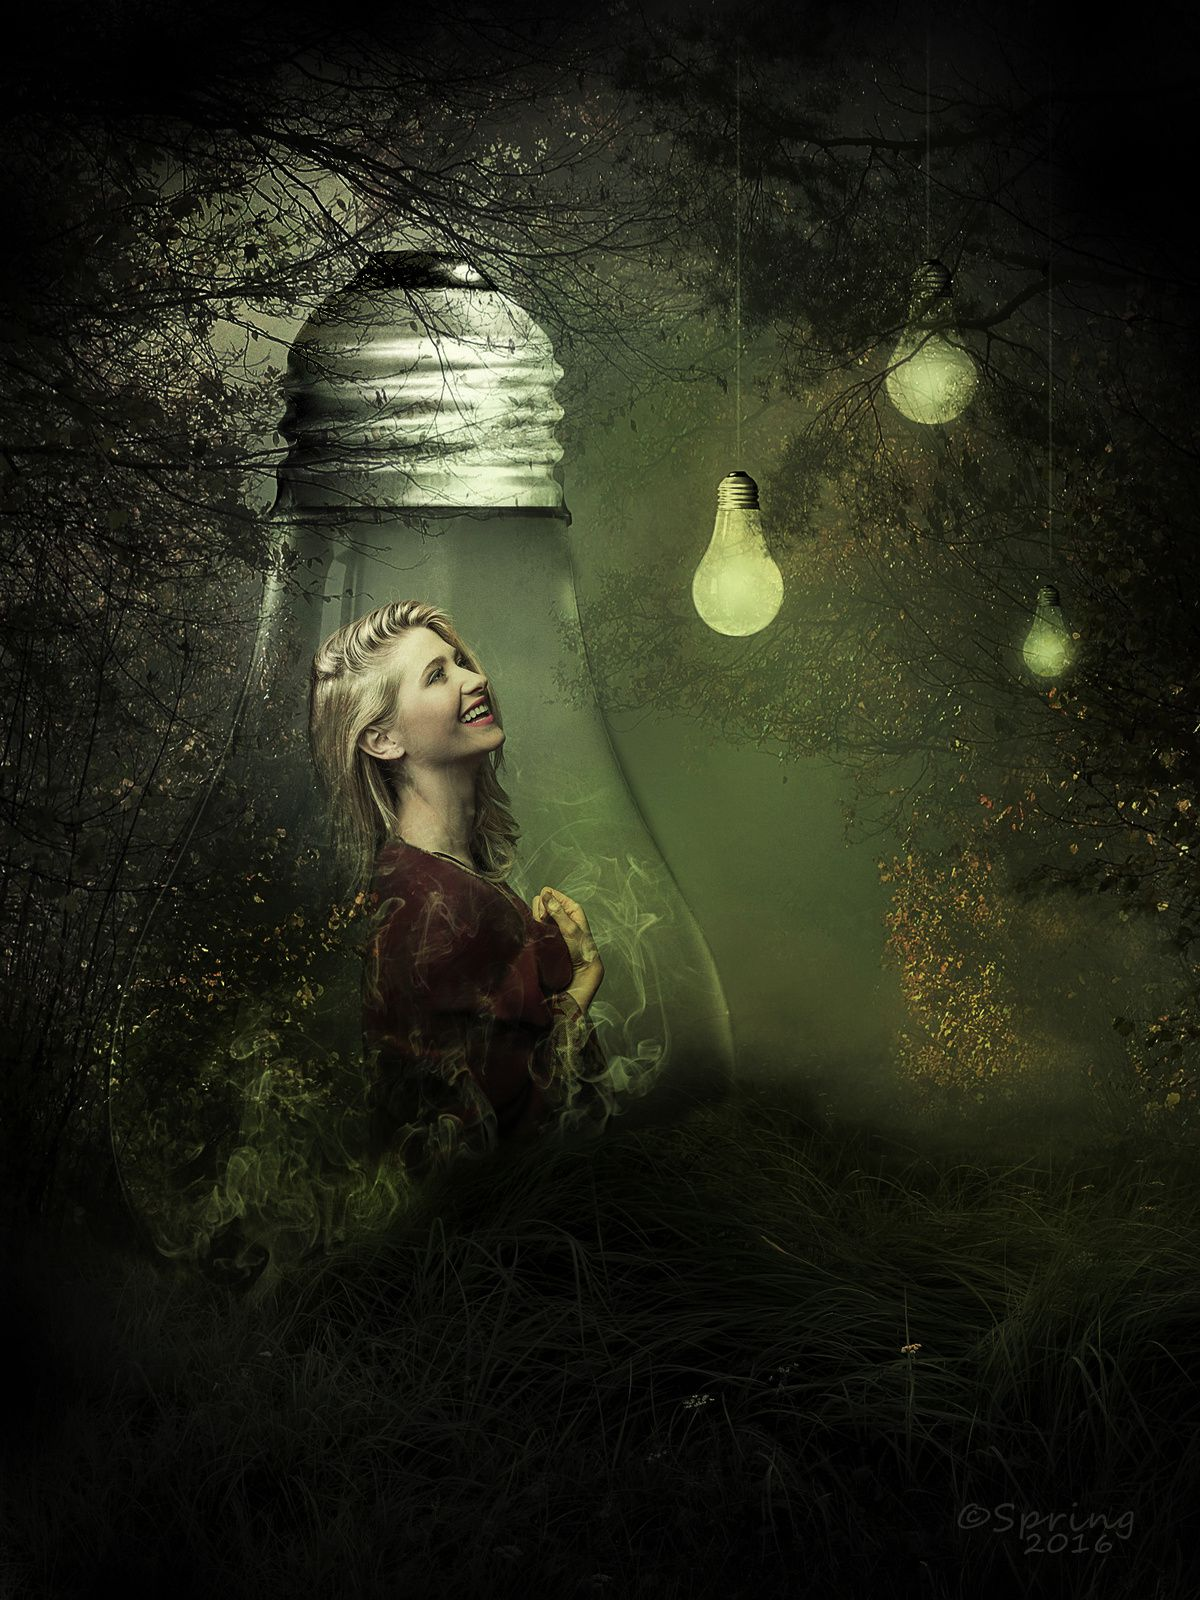 Magic green light